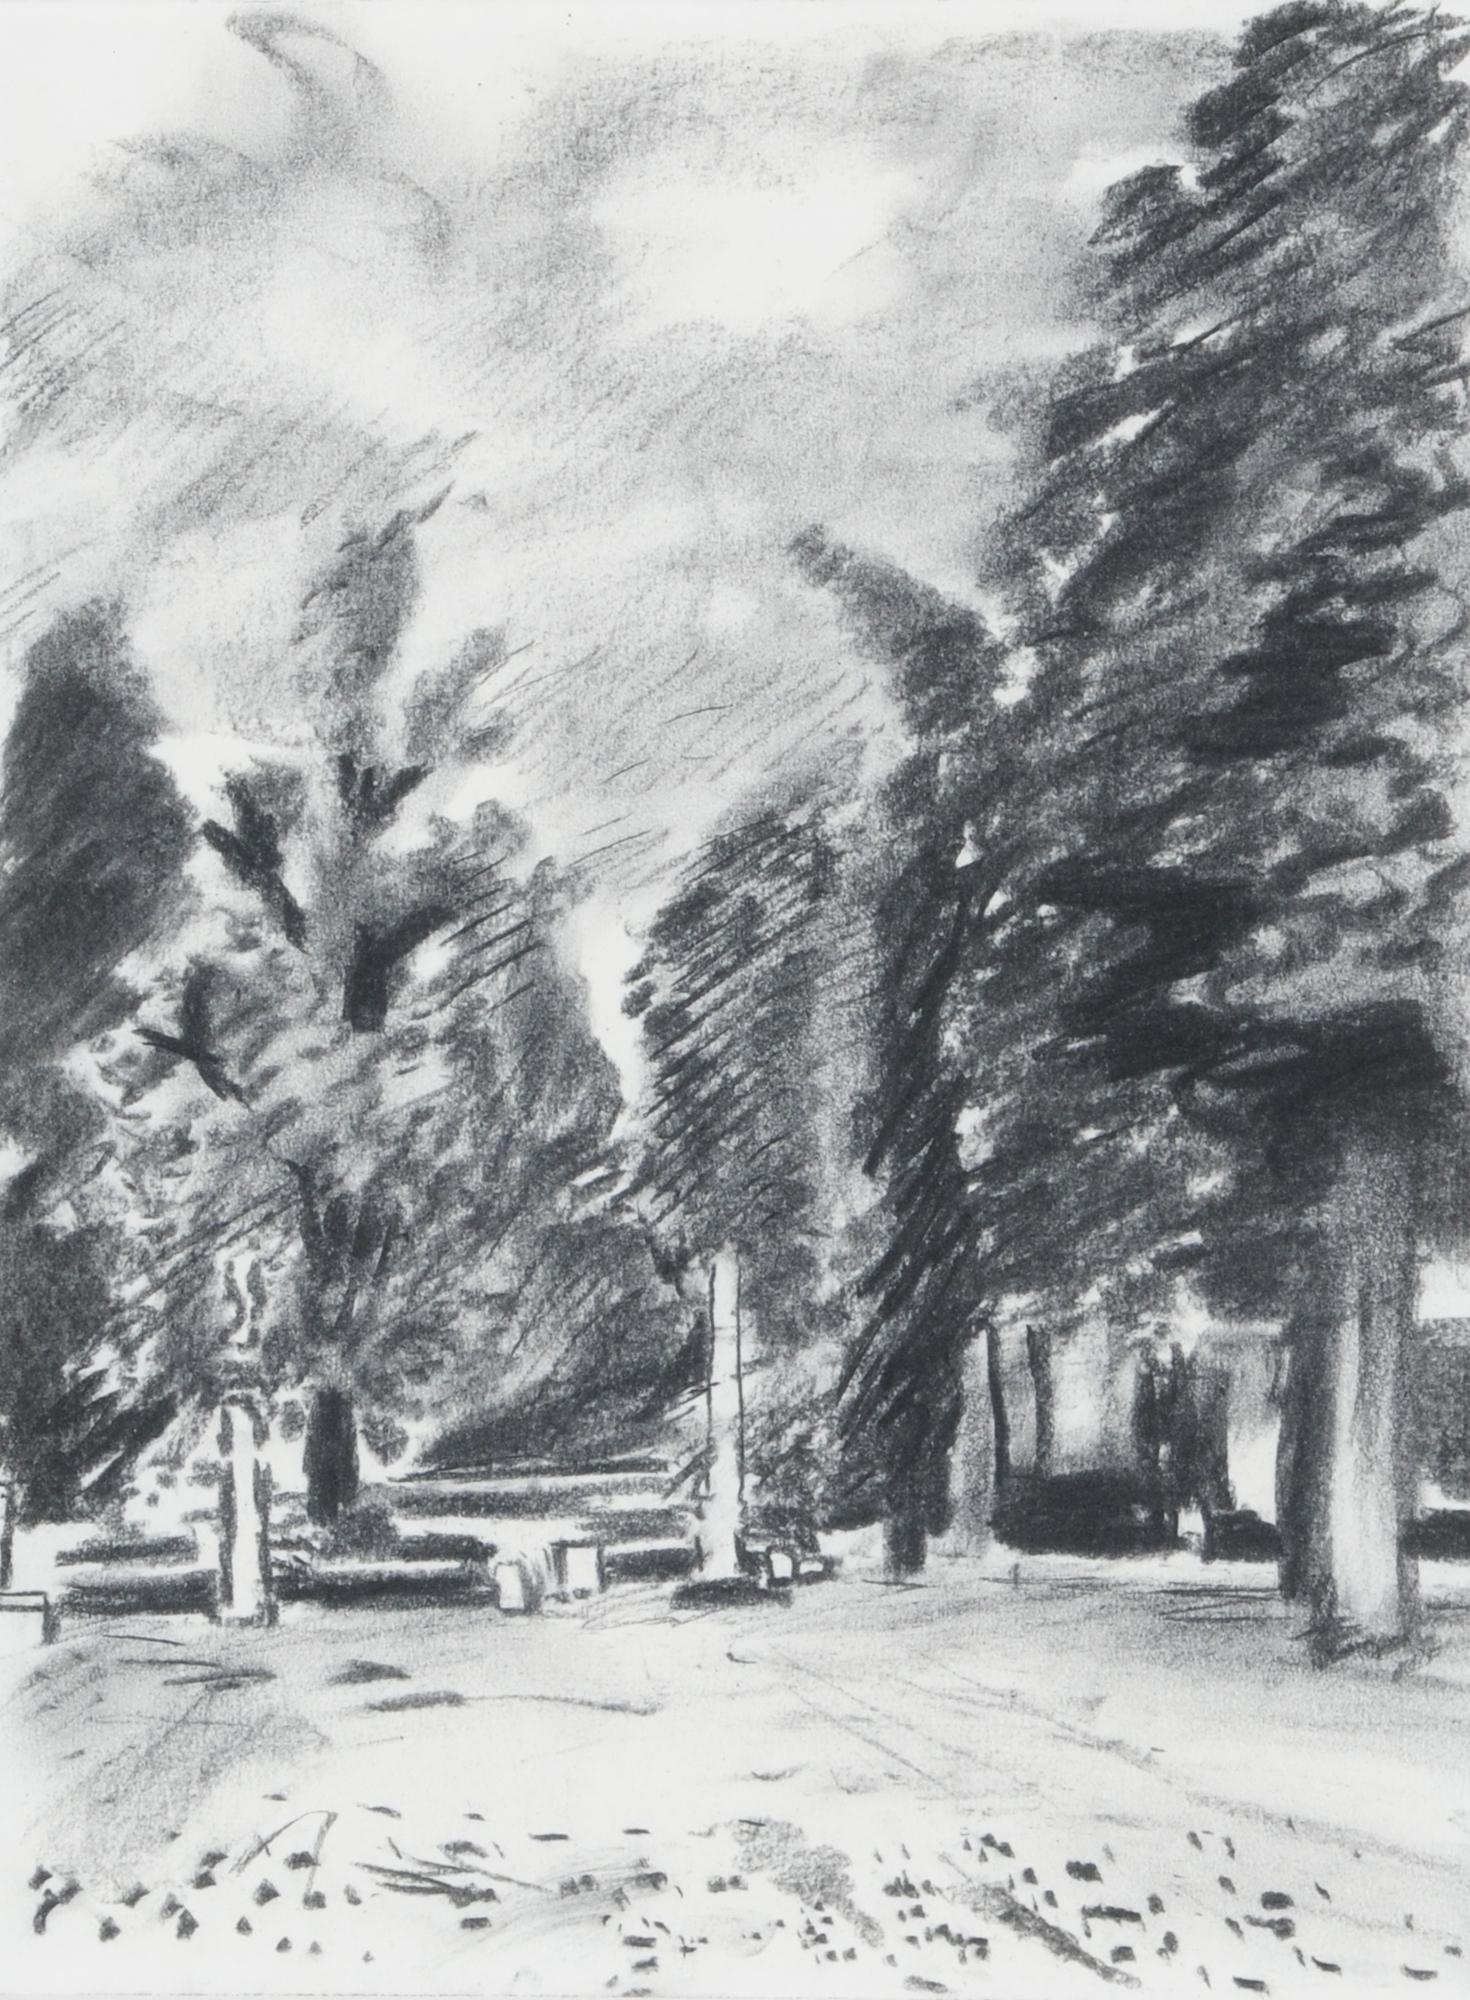 Weischer Matthias, 3 drawings: Untitled; Untitled; Untitled